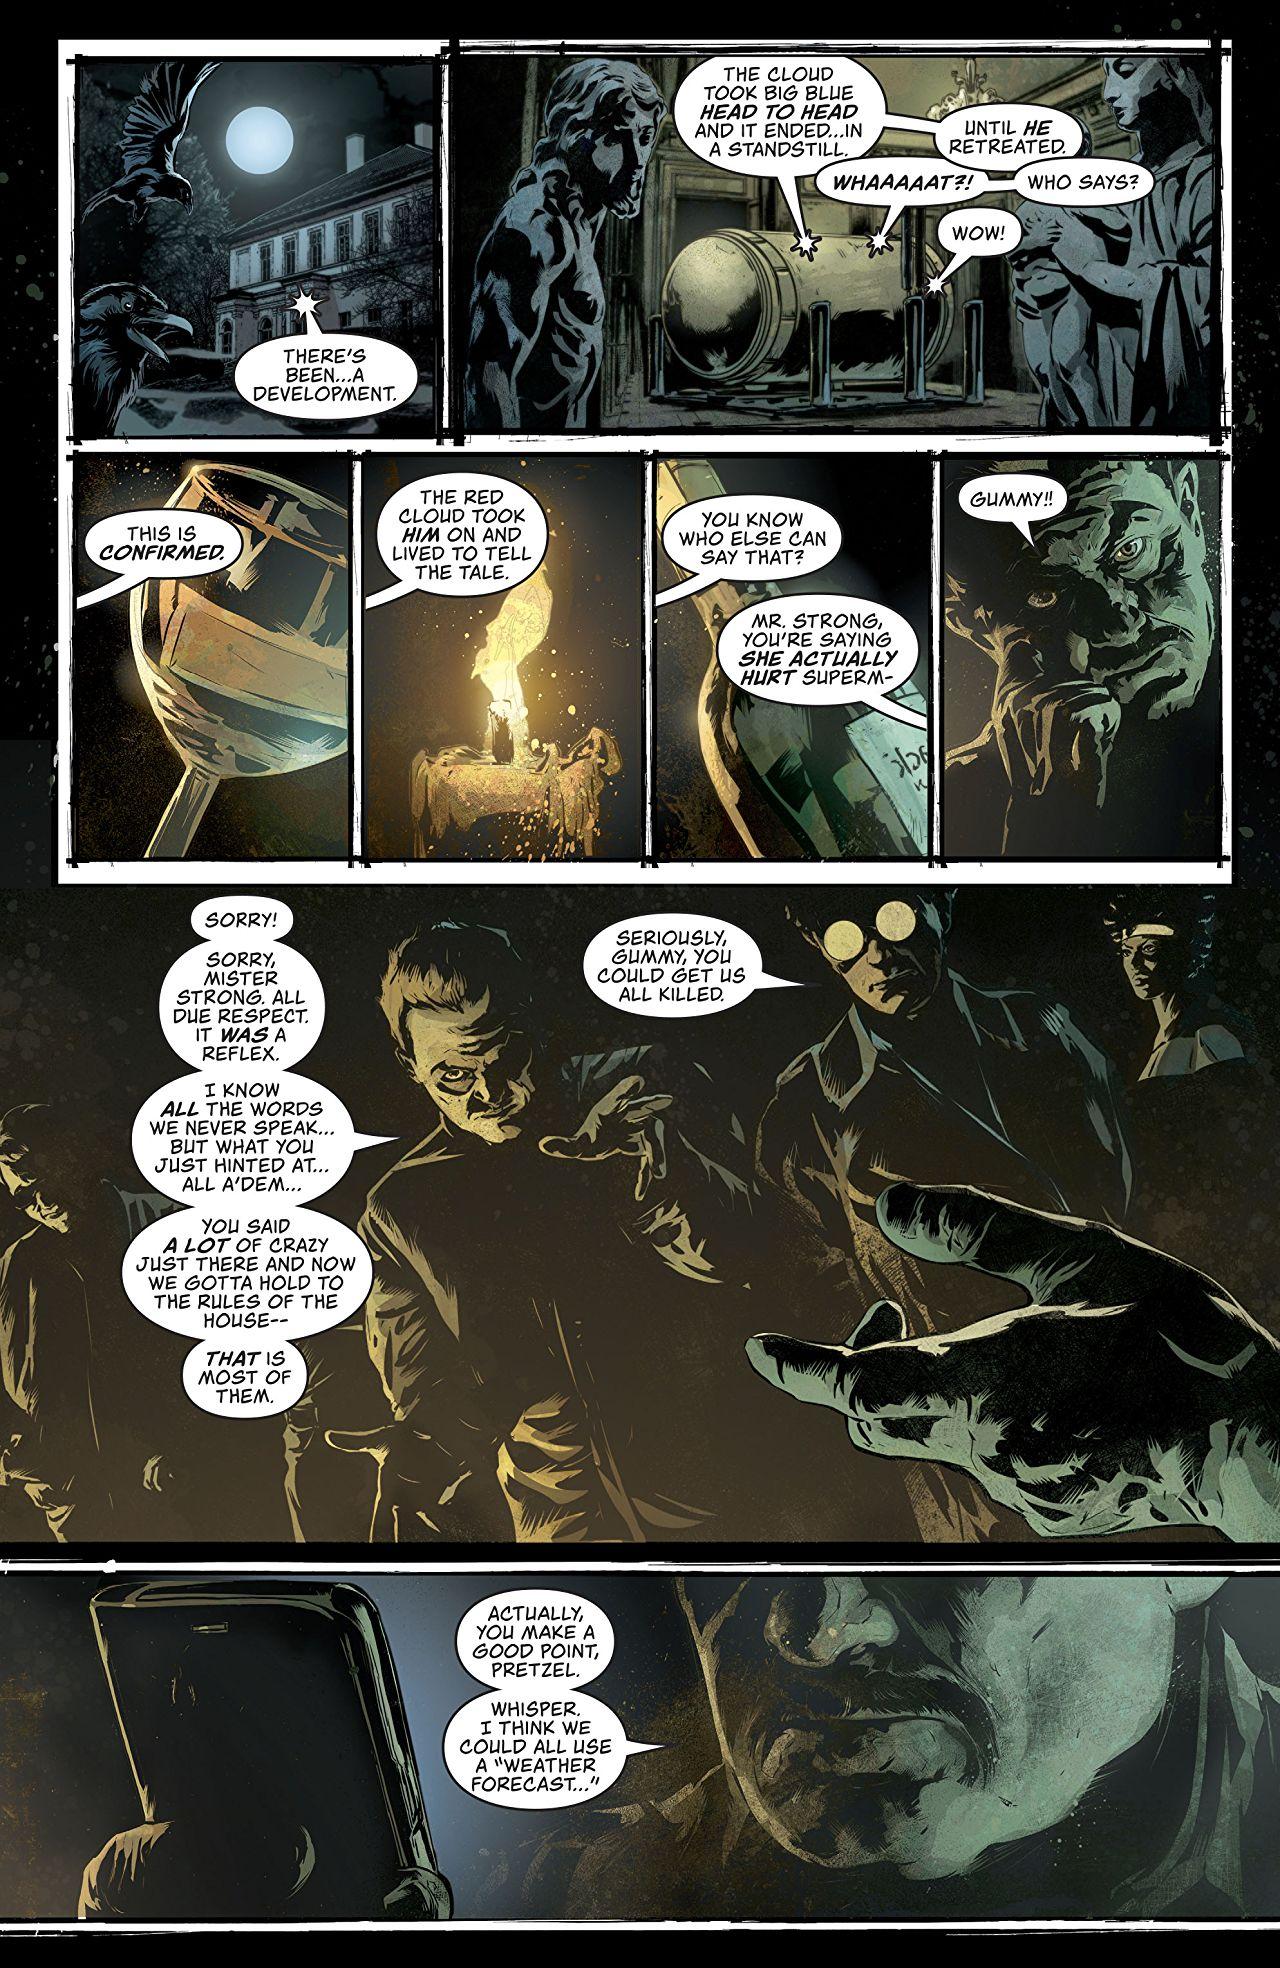 Action Comics 1012 1.jpg